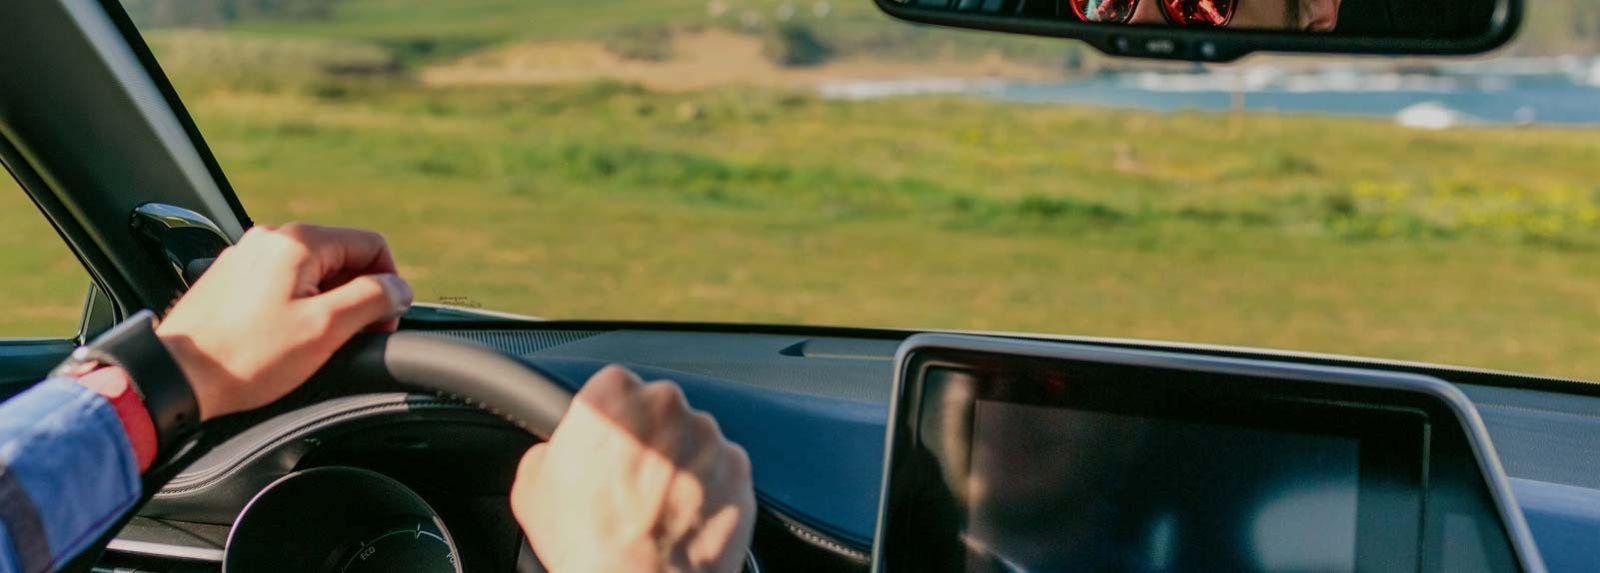 Avis Romania car rental